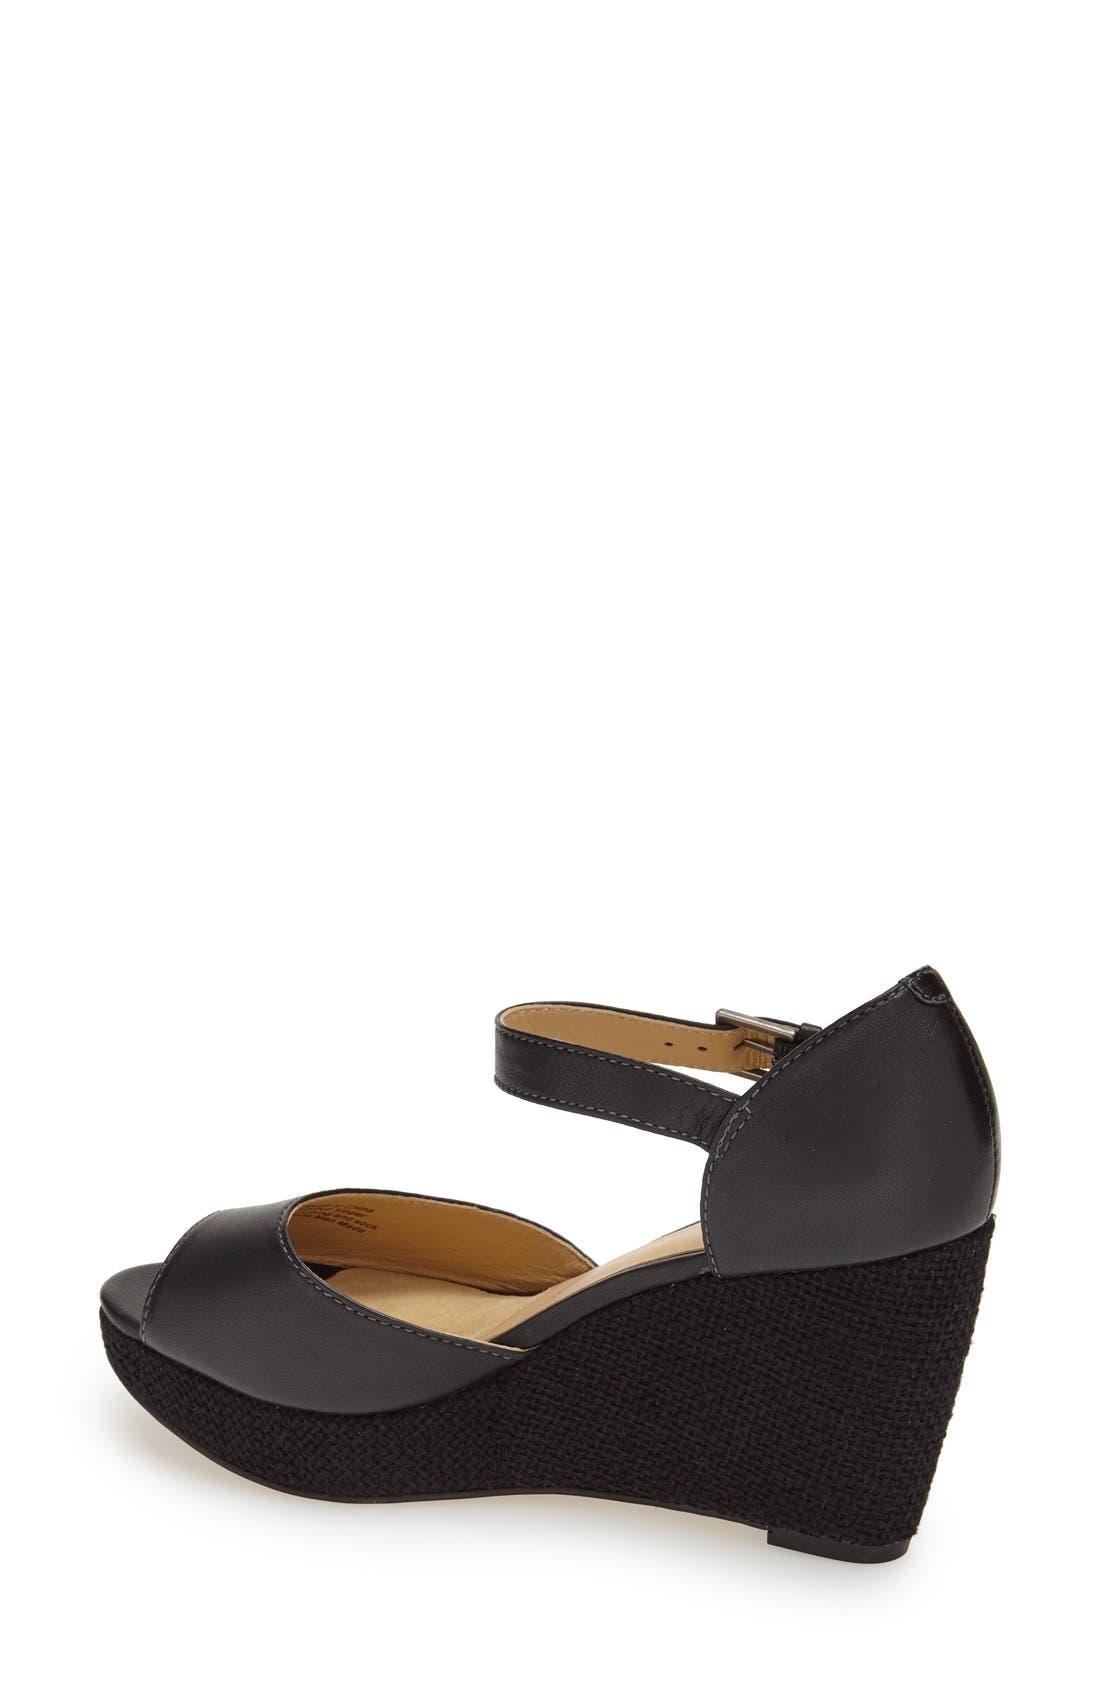 Alternate Image 2  - Trotters 'Amber' Wedge Sandal (Women)